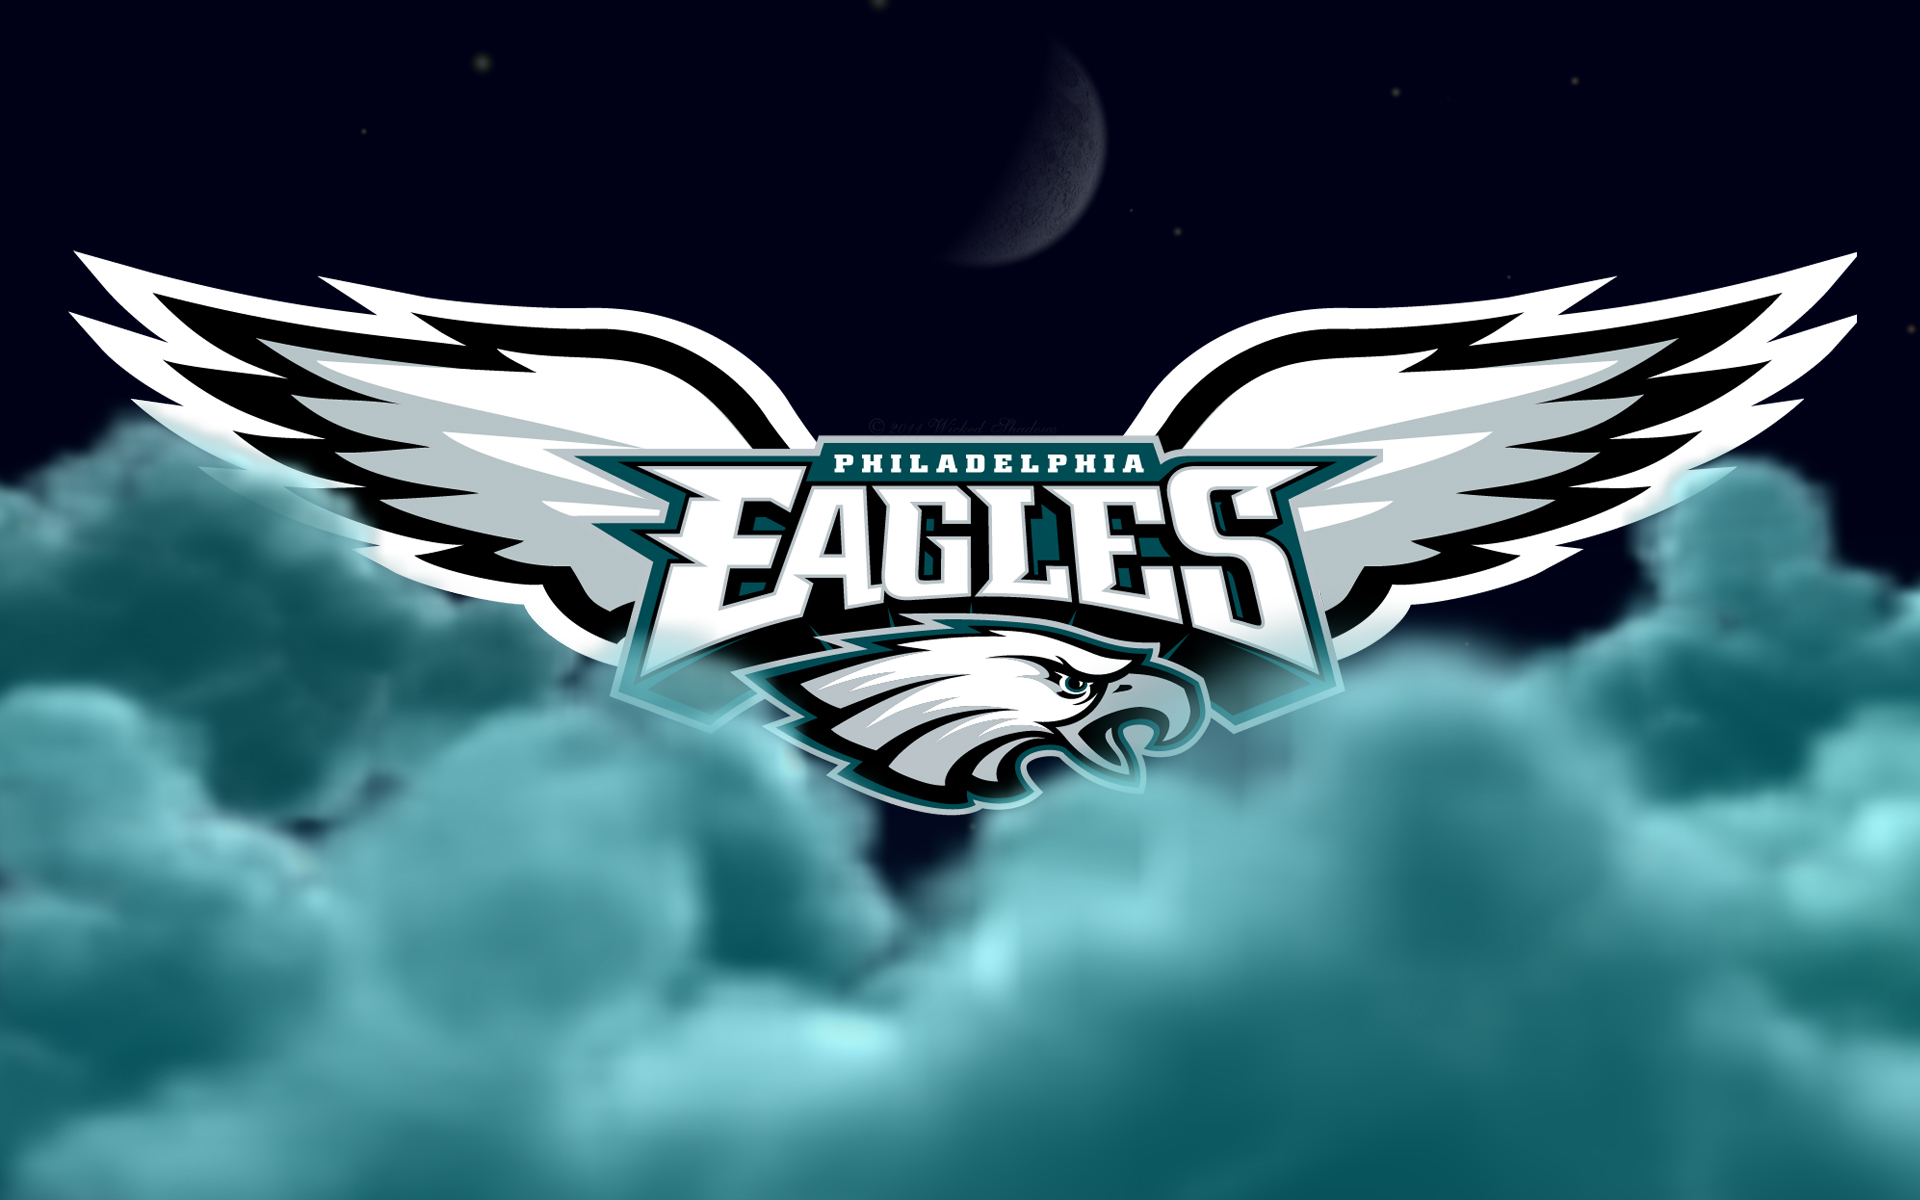 Philadelphia eagles clipart free download graphic freeuse stock Free Philadelphia Eagles Logo, Download Free Clip Art, Free ... graphic freeuse stock